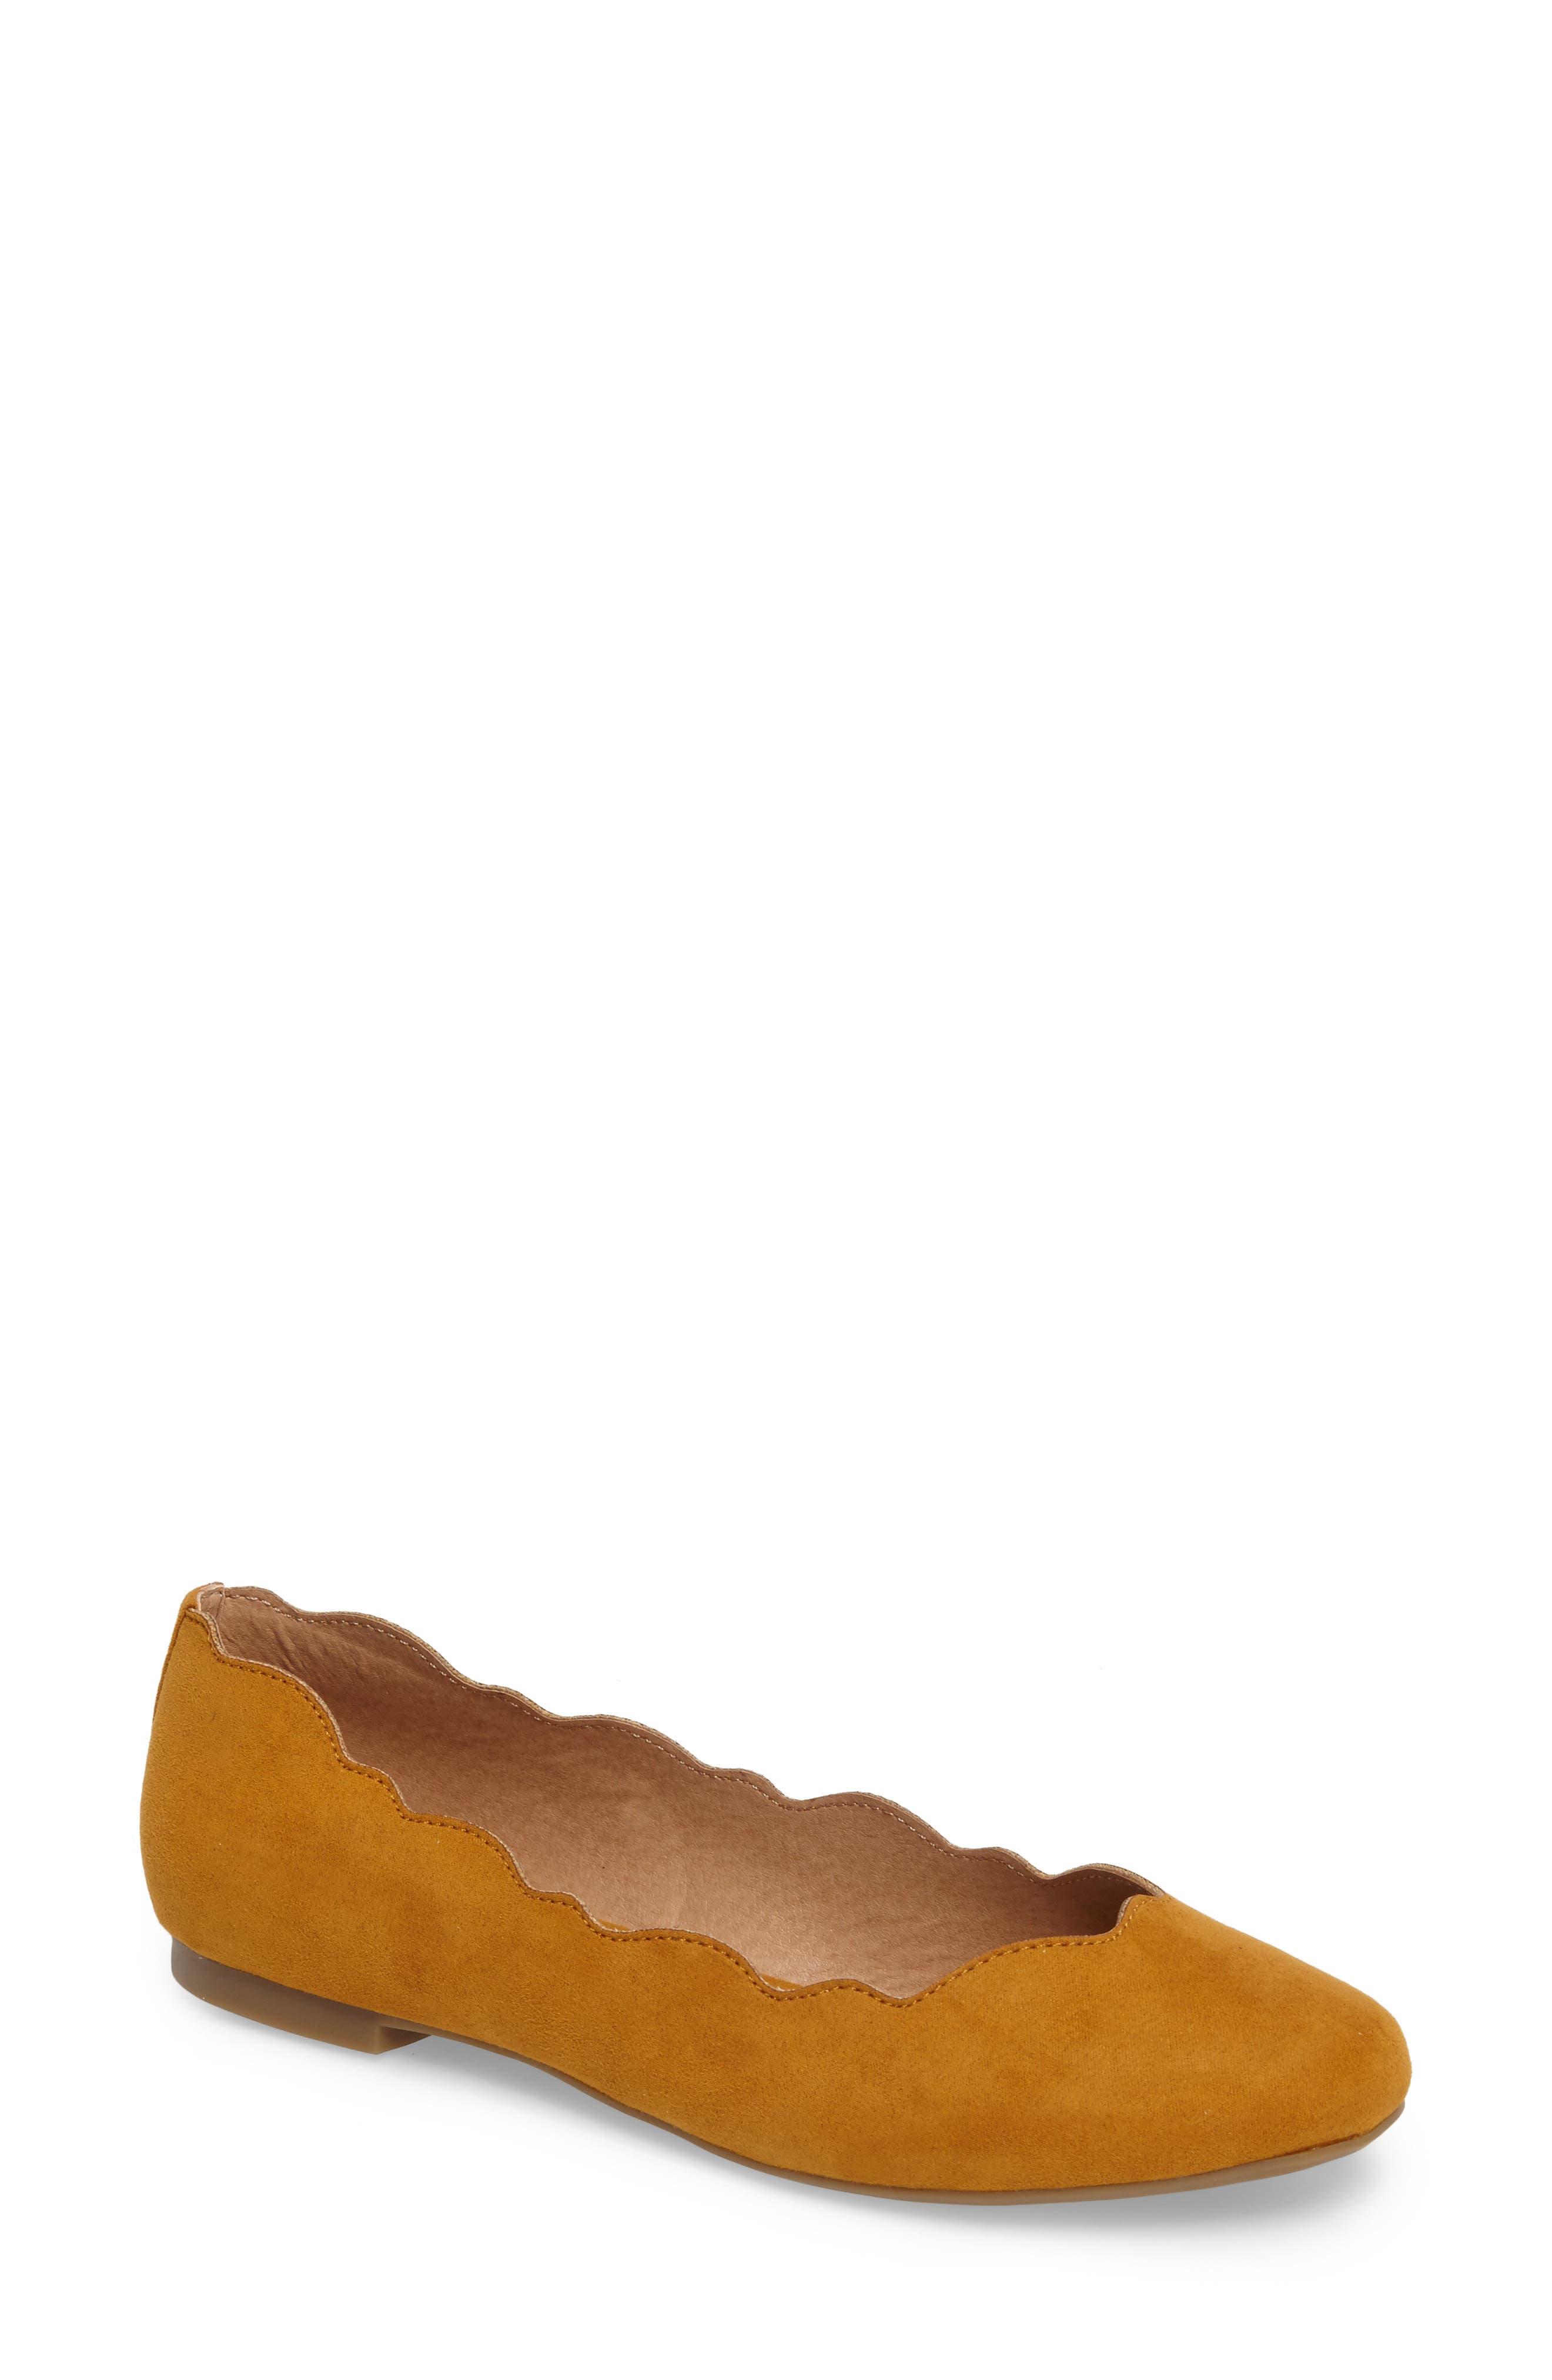 Tallye Ballet Flat,                         Main,                         color, Tan Faux Suede